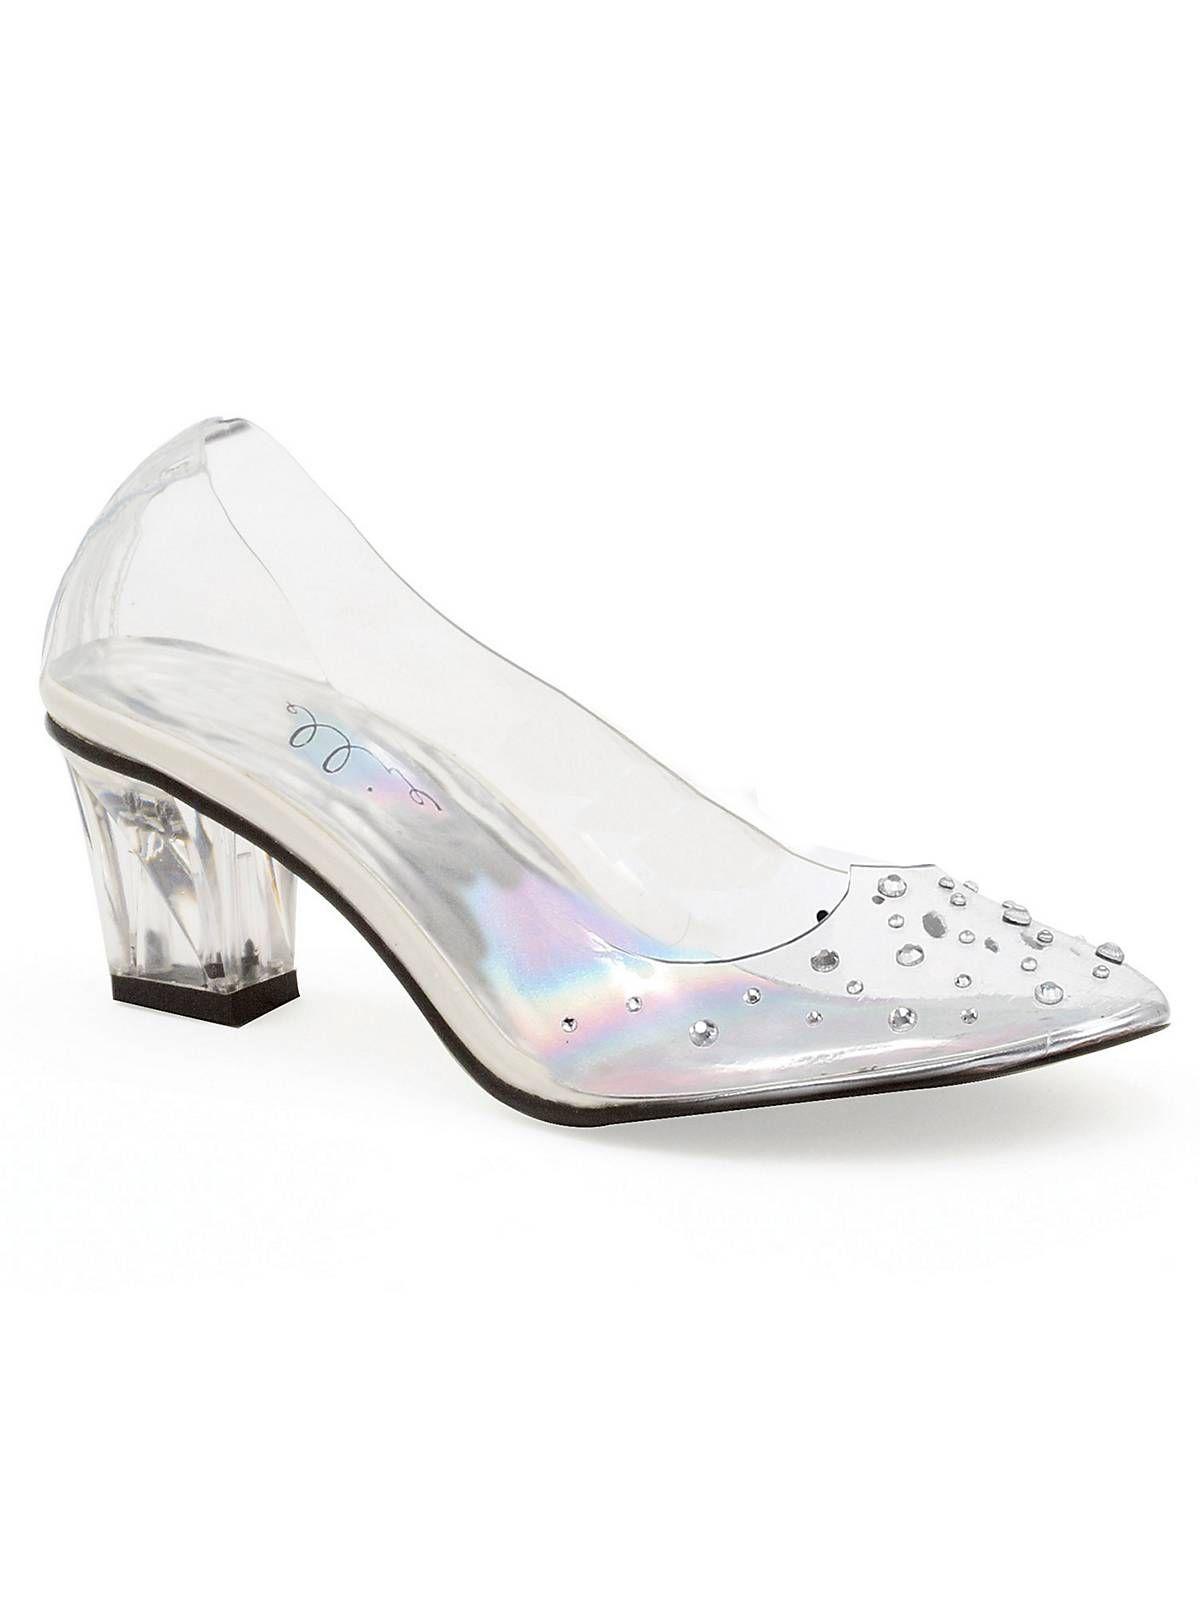 Princess Slipper for Child | Kids heels